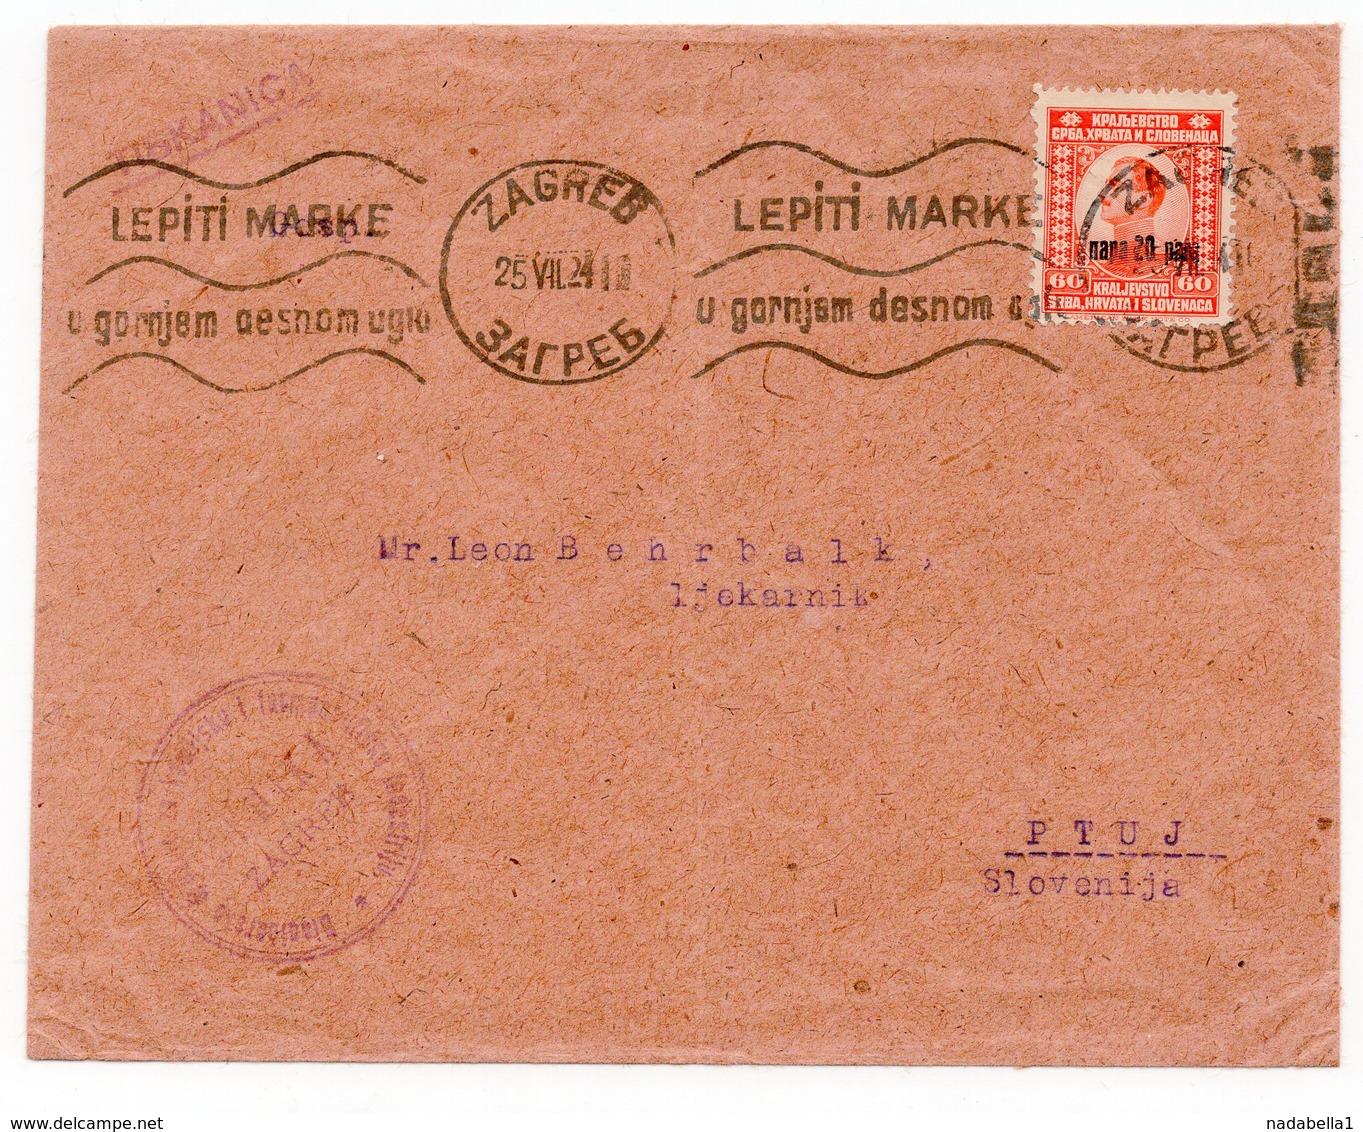 1924 YUGOSLAVIA, CROATIA, ZAGREB TO PTUJ, DIONICKO DRUSTVO ZA FARMACIJU I INDUSTRIJU, FLAM - 1919-1929 Kingdom Of Serbs, Croats And Slovenes